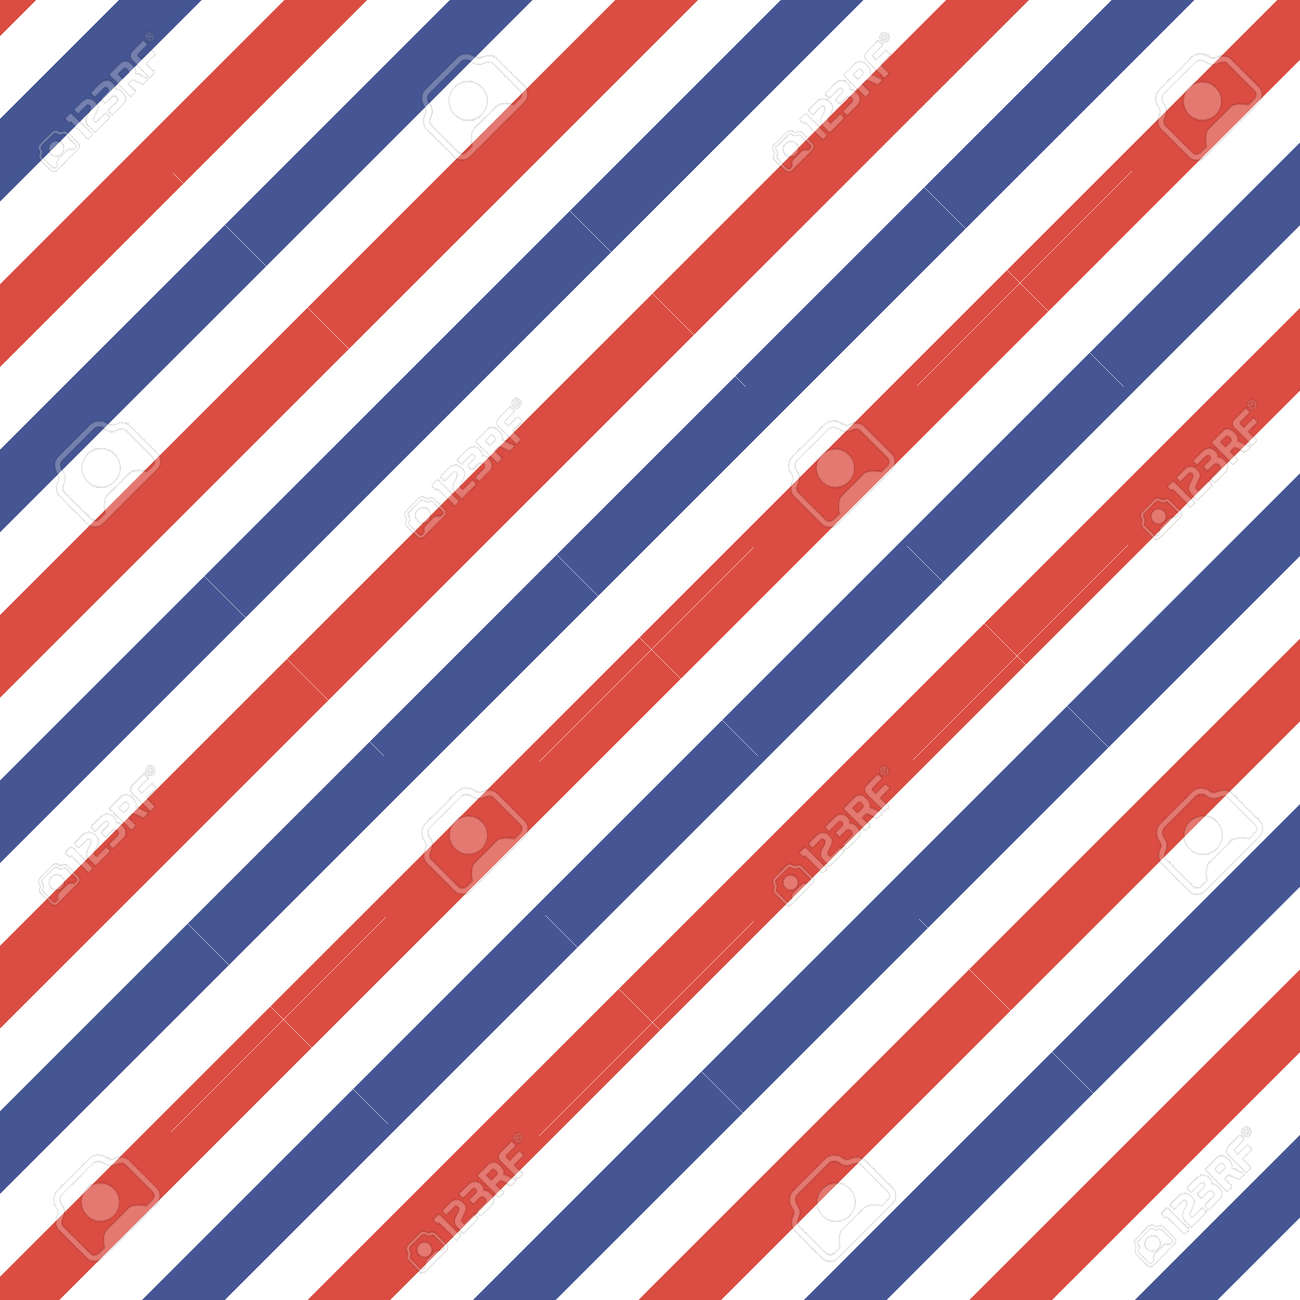 Vector Barber Pole Wallpaper Background